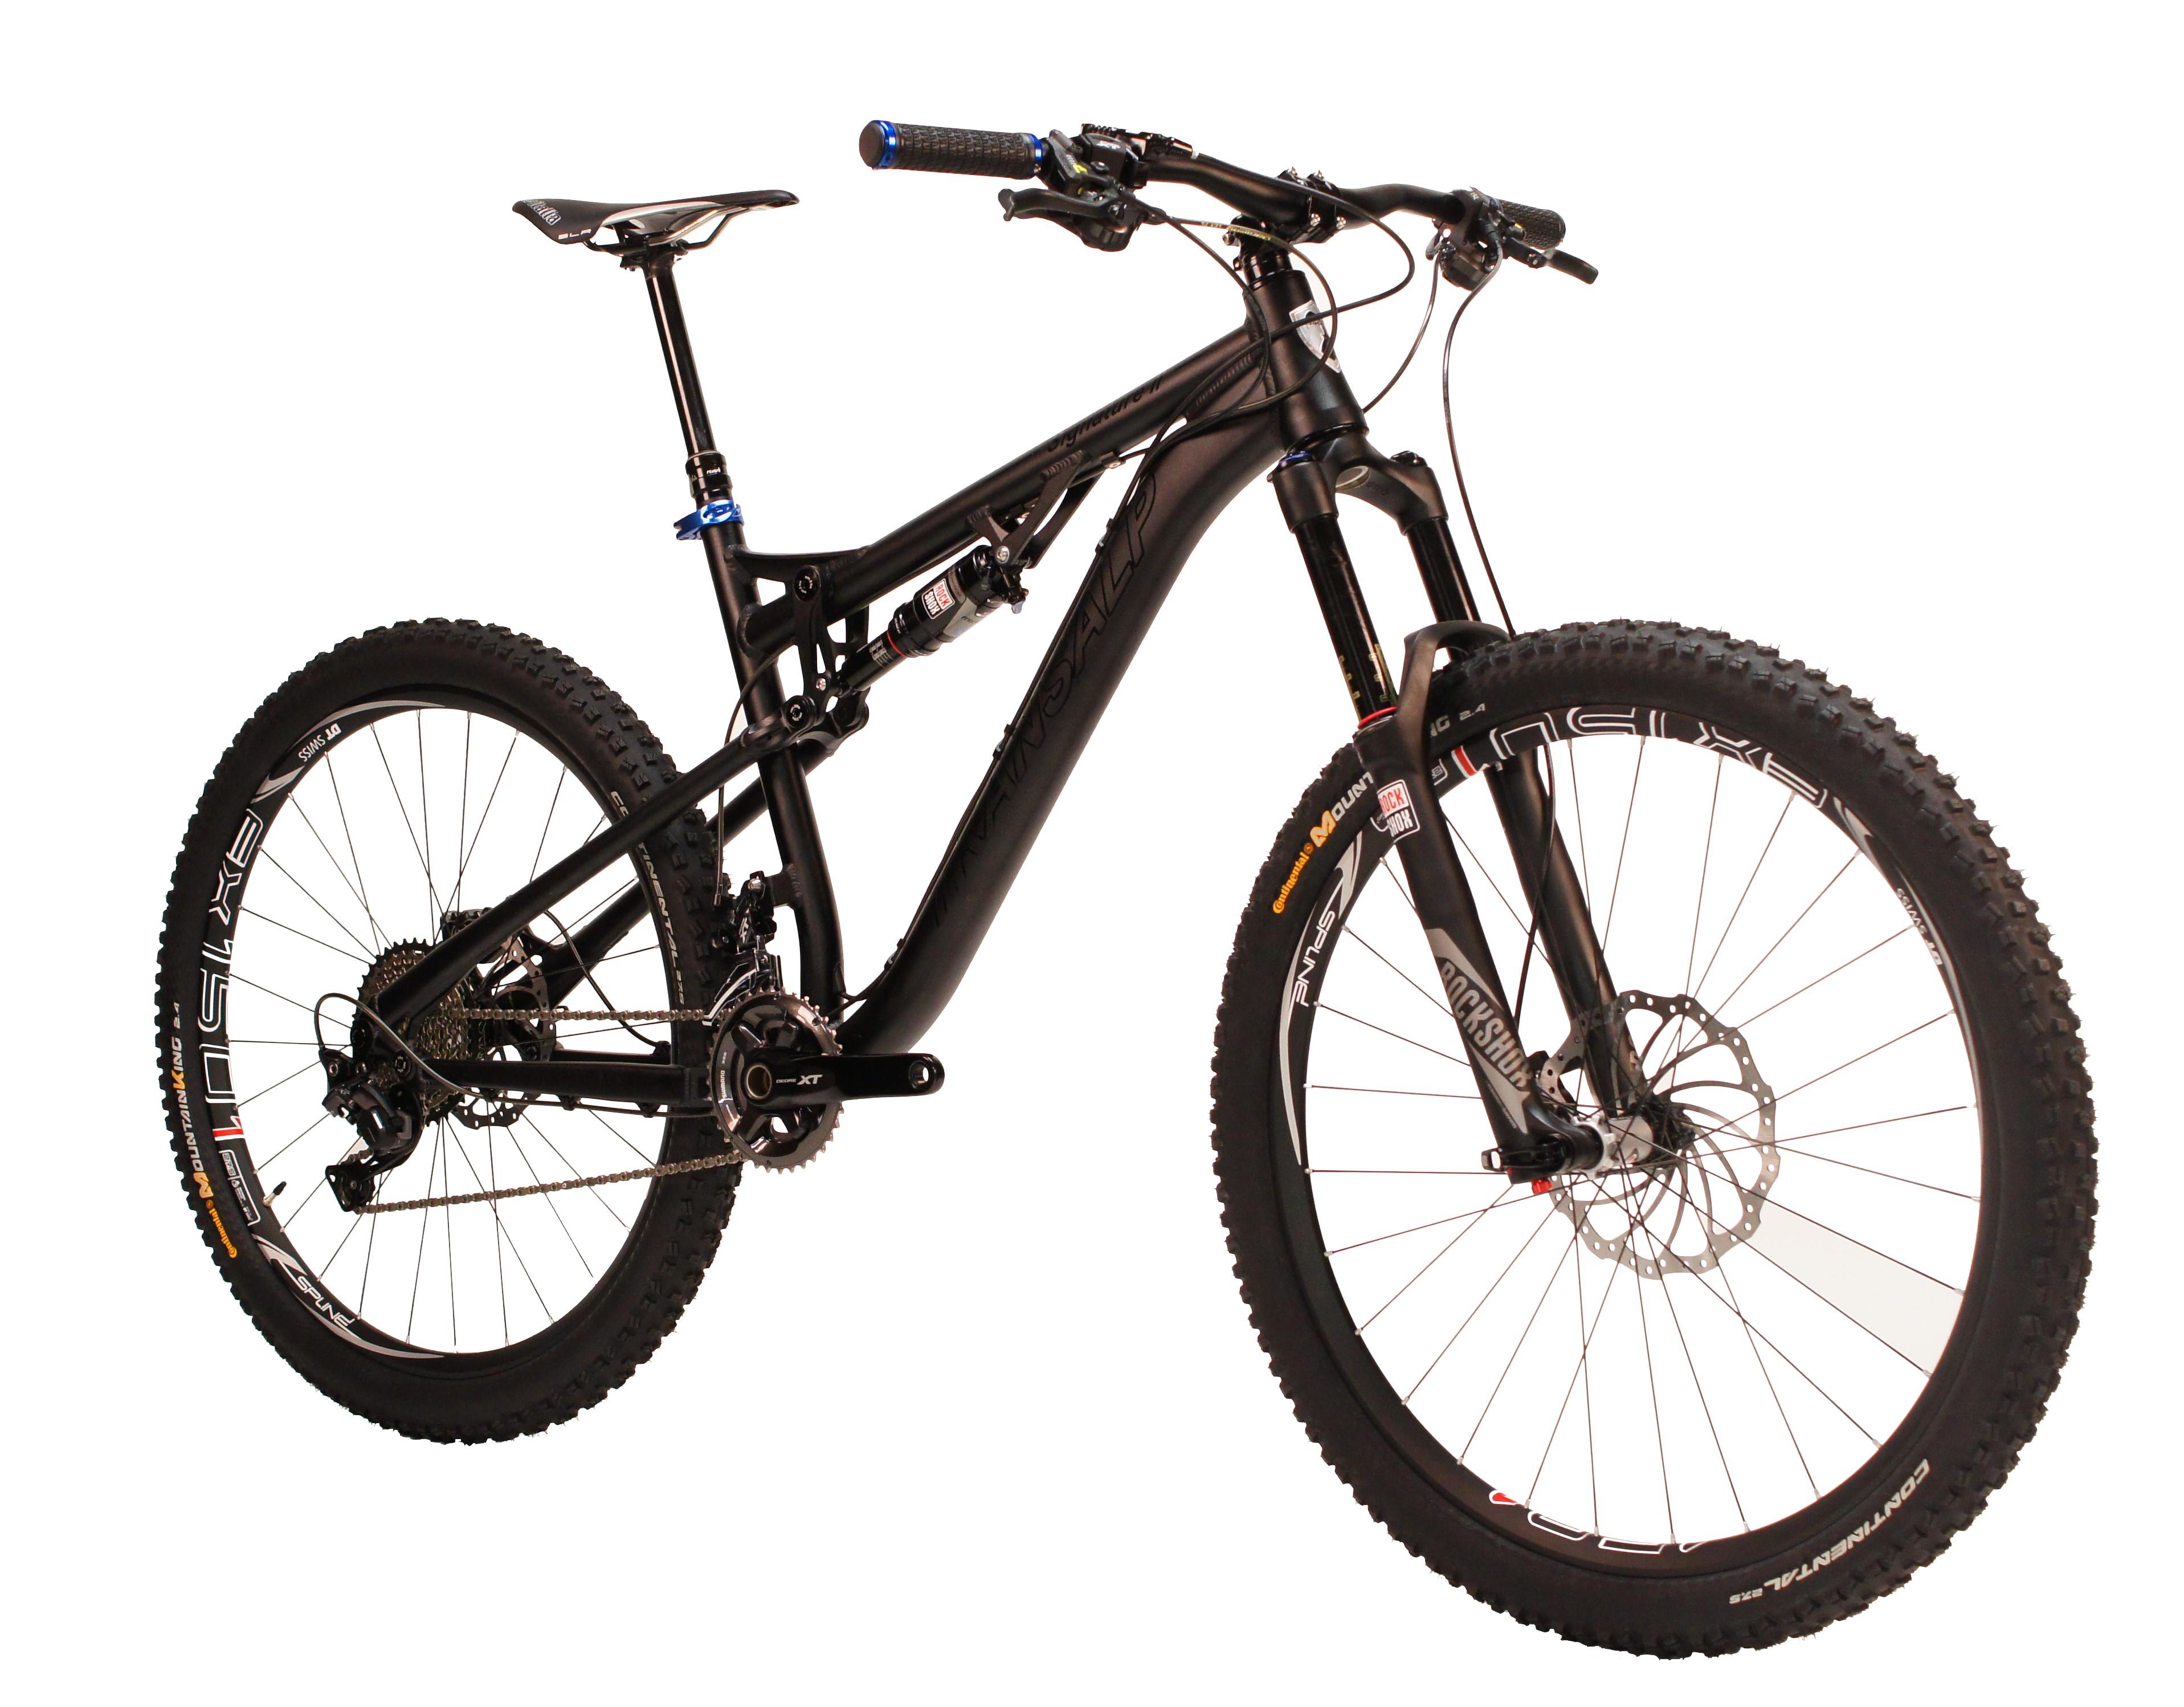 mountainbikes transalp bikes transalp bikes. Black Bedroom Furniture Sets. Home Design Ideas